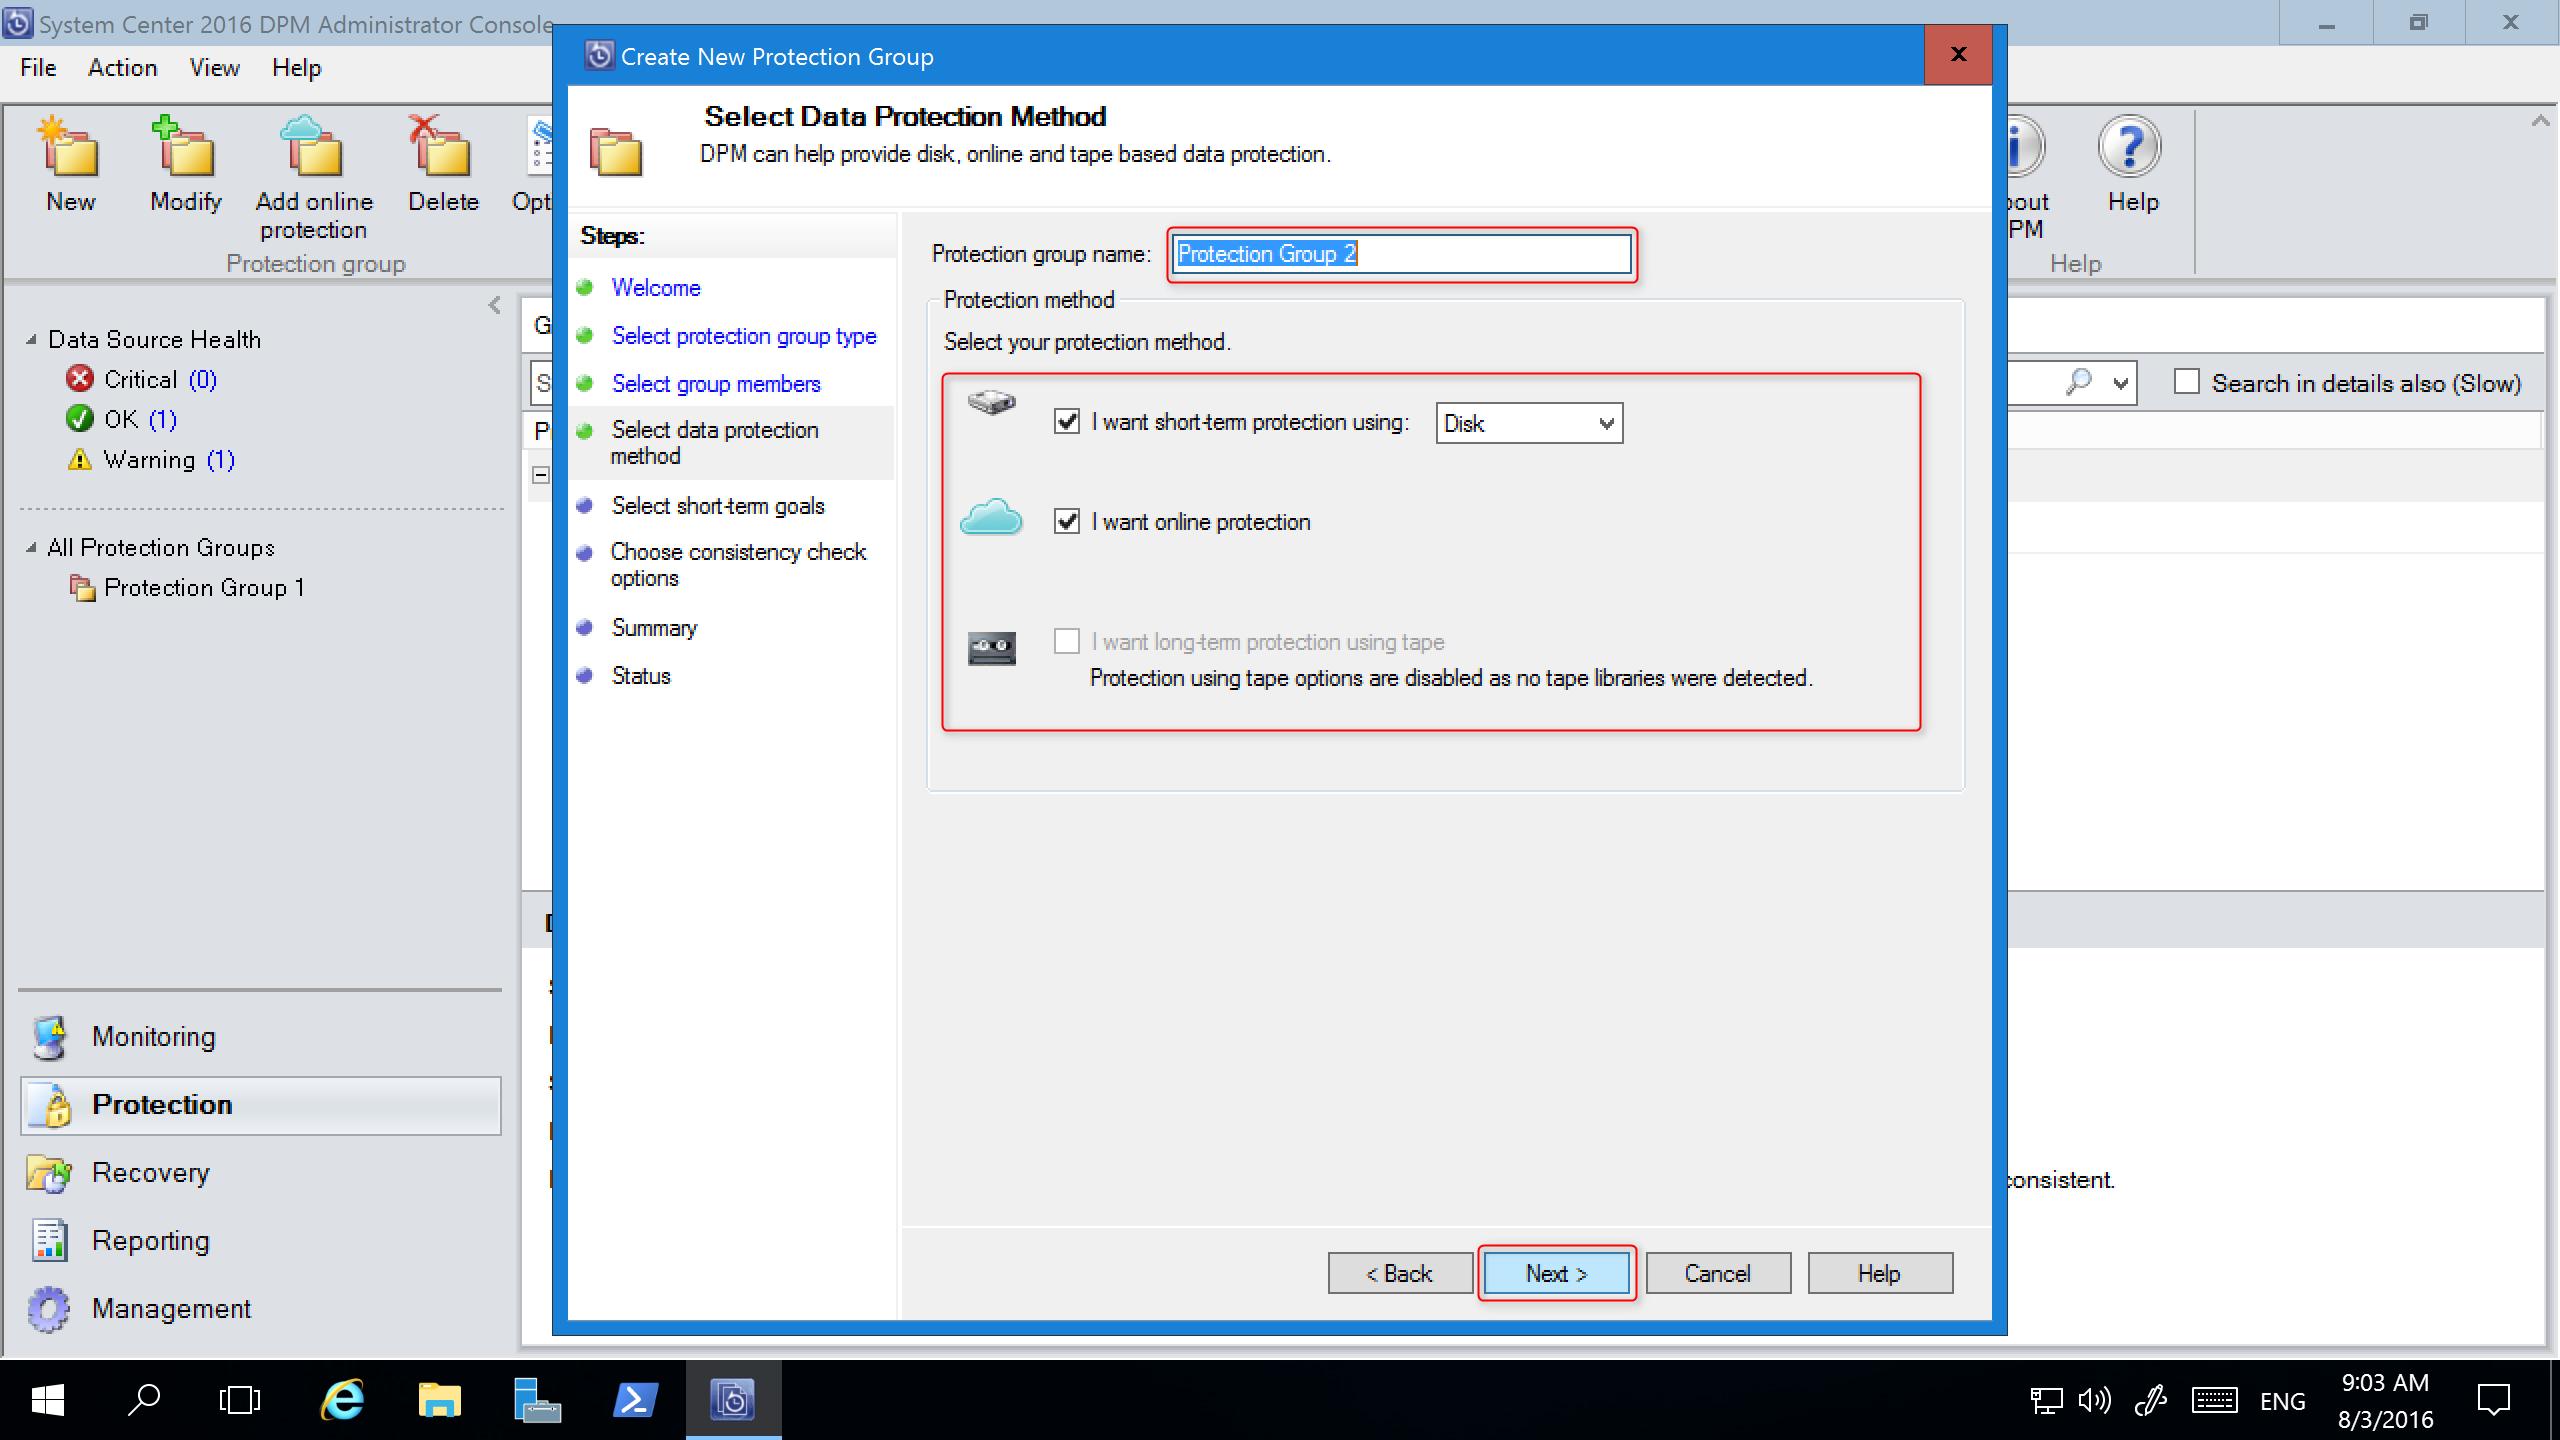 Upgrade your System Center DPM | Microsoft Docs